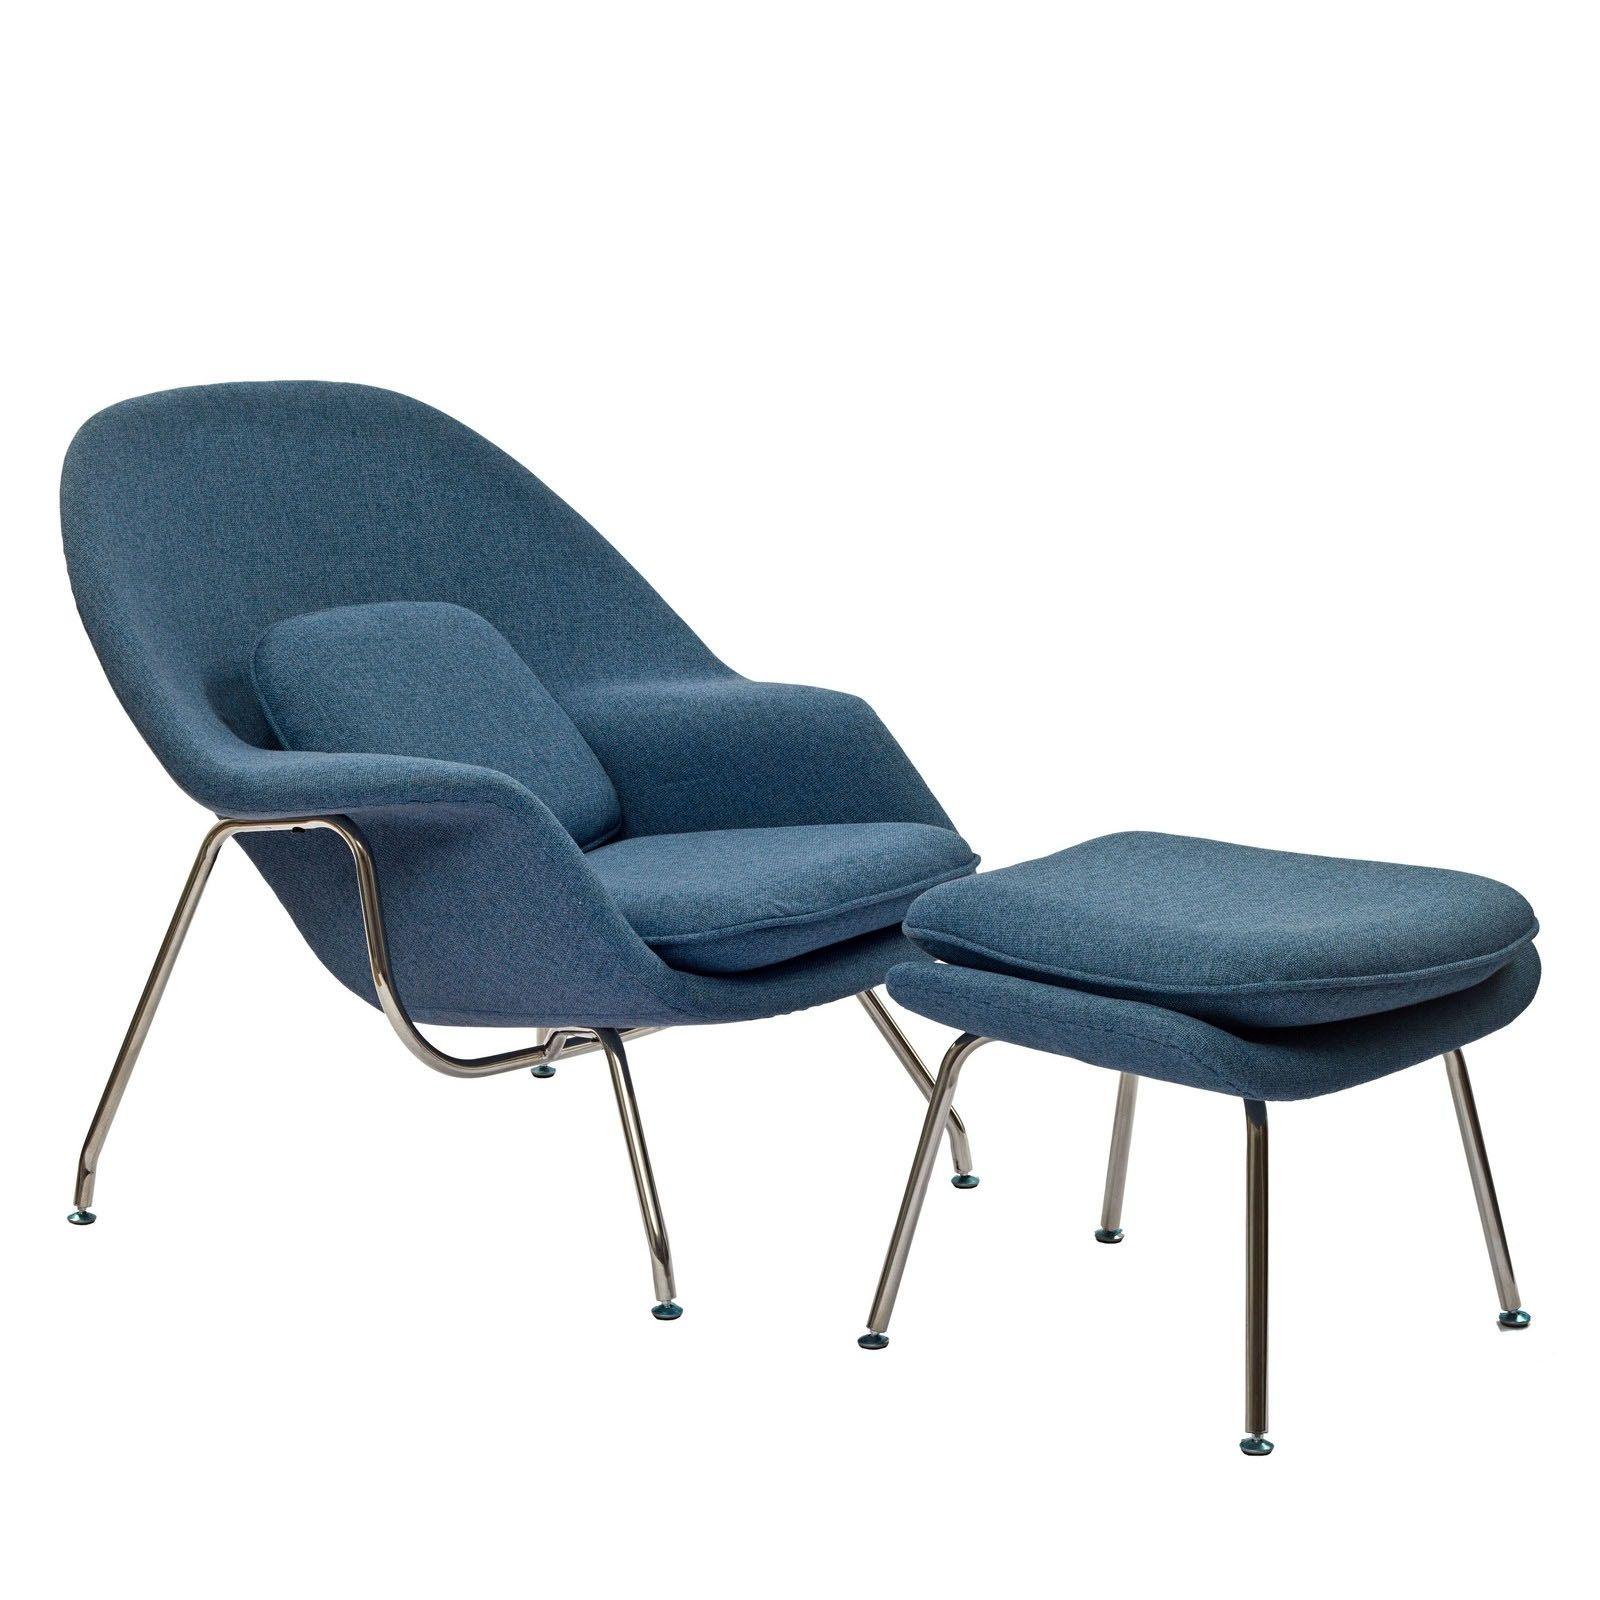 Nest Lounge and Ottoman Set - Navy Blue Tweed | dotandbo.com